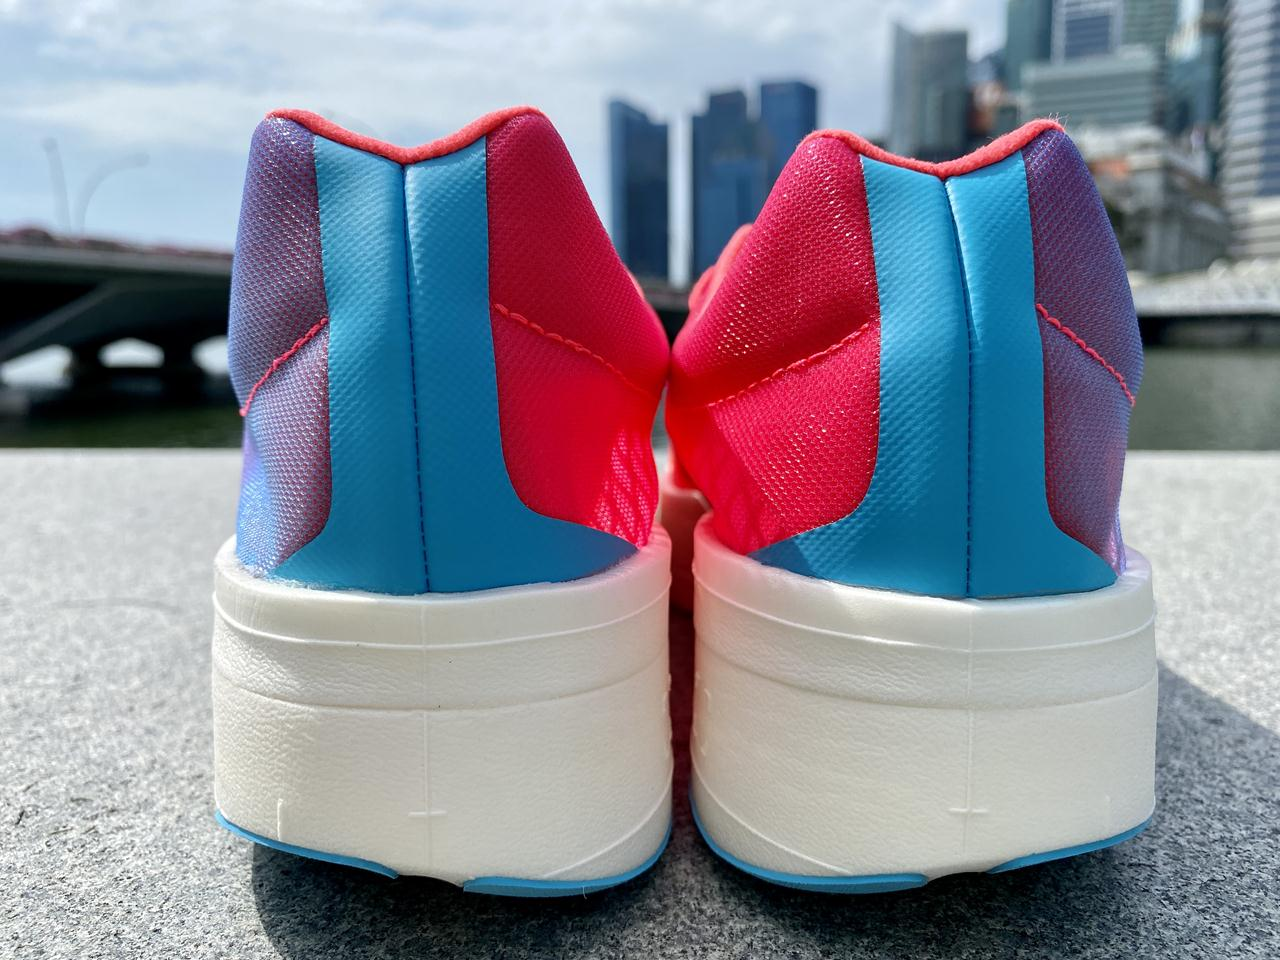 Adidas Adizero Adios Pro - Talon